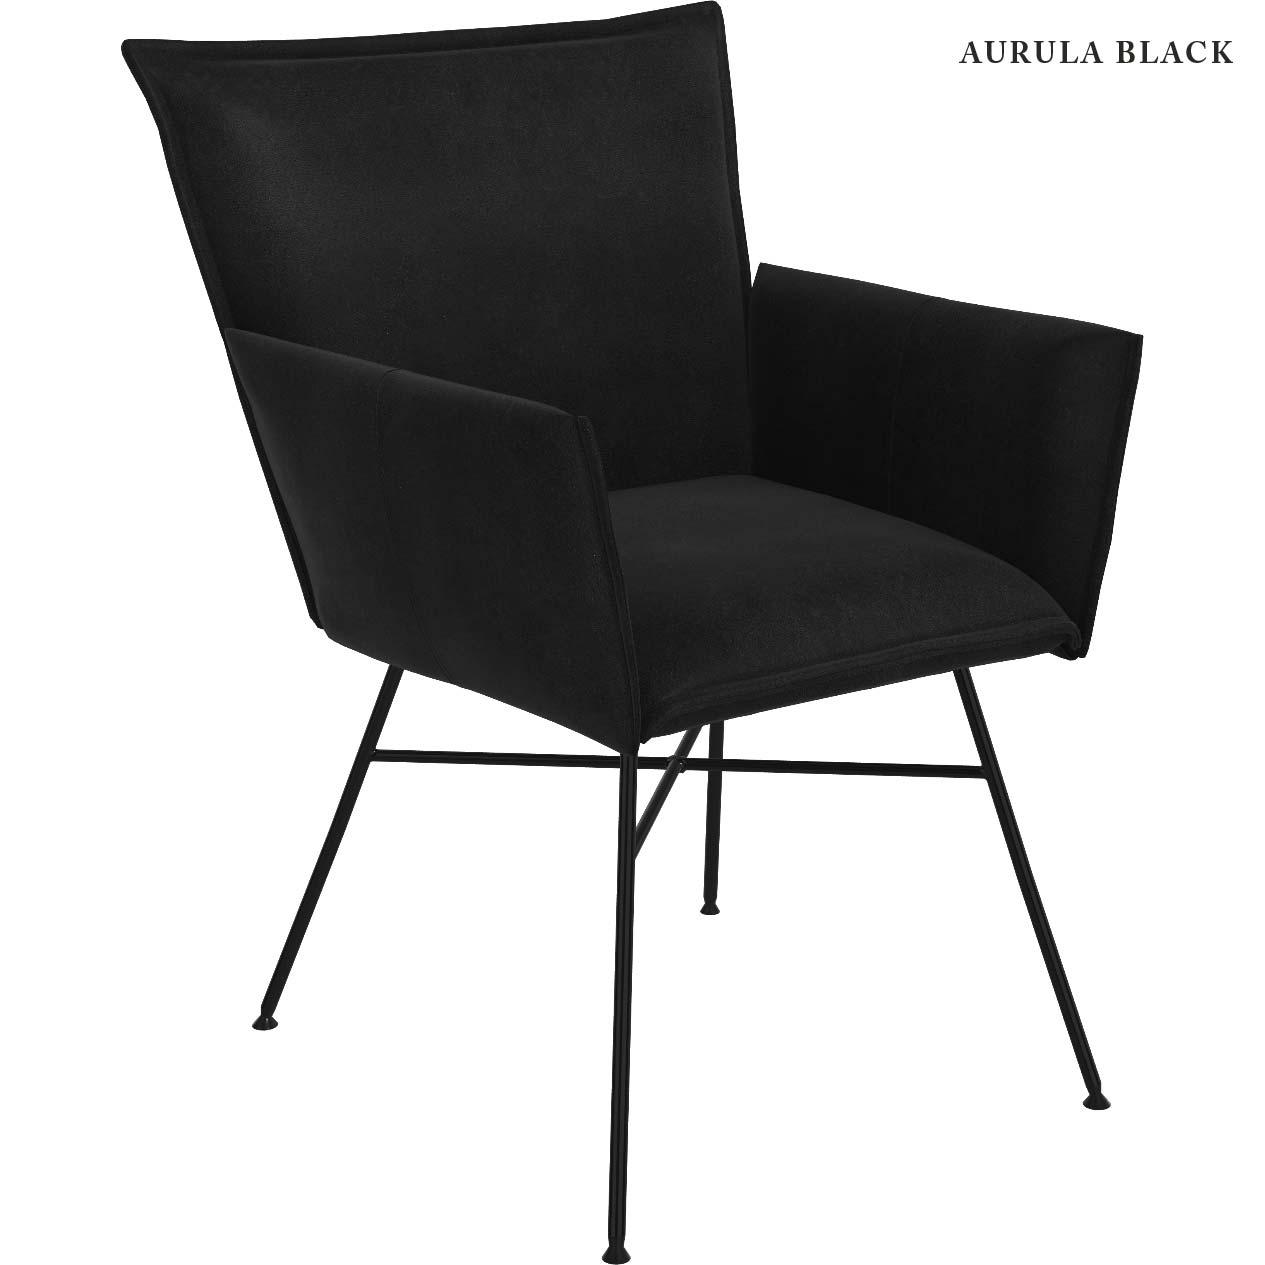 jess-design-sessel-stuhl-sanne-armlehne-aurula-black-lichtraum24